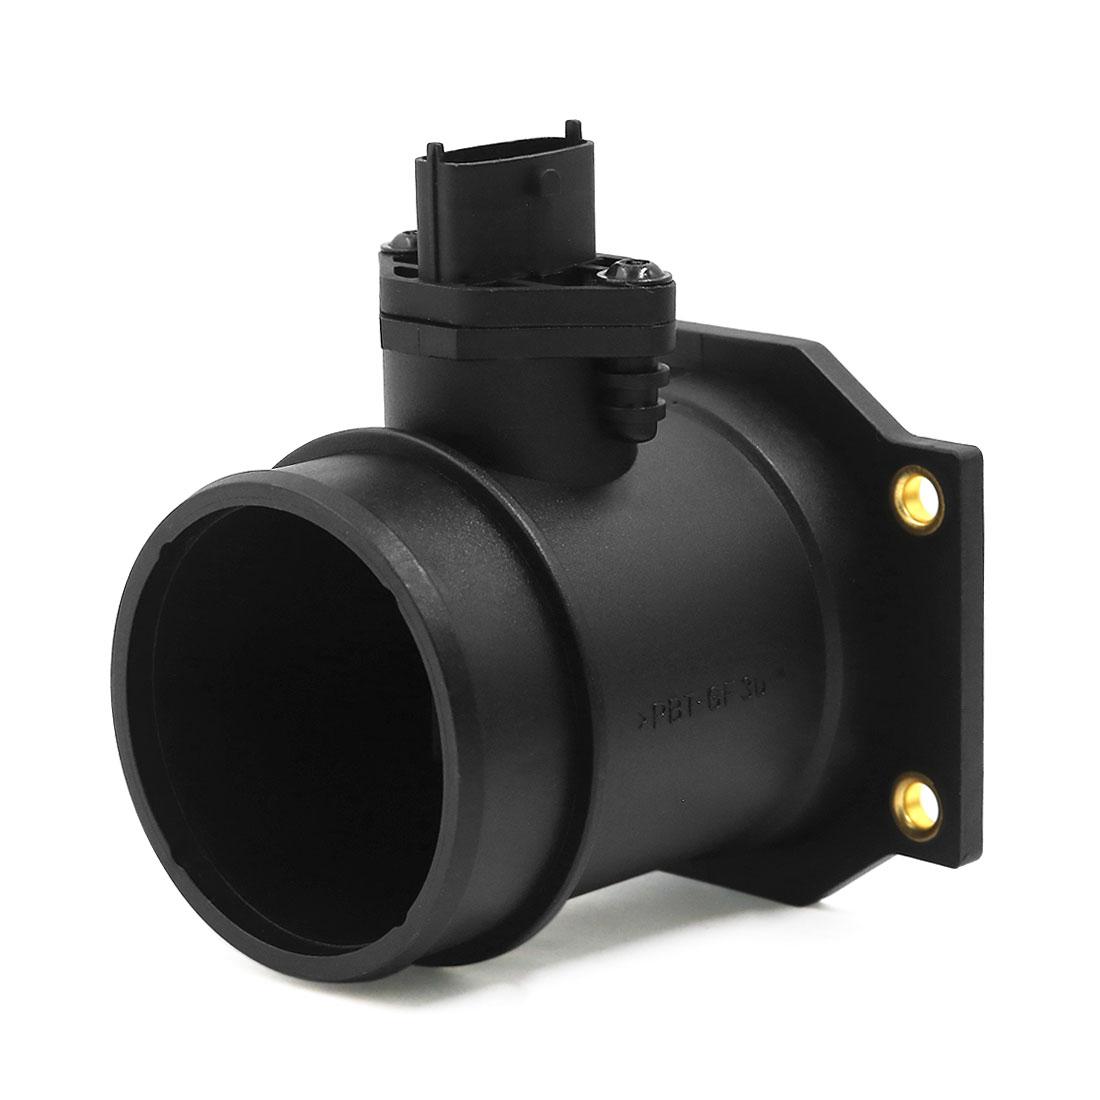 Mass Air Flow Meter MAF Sensor For NISSAN 22680 7F400 / 22680 7F425 High Quality